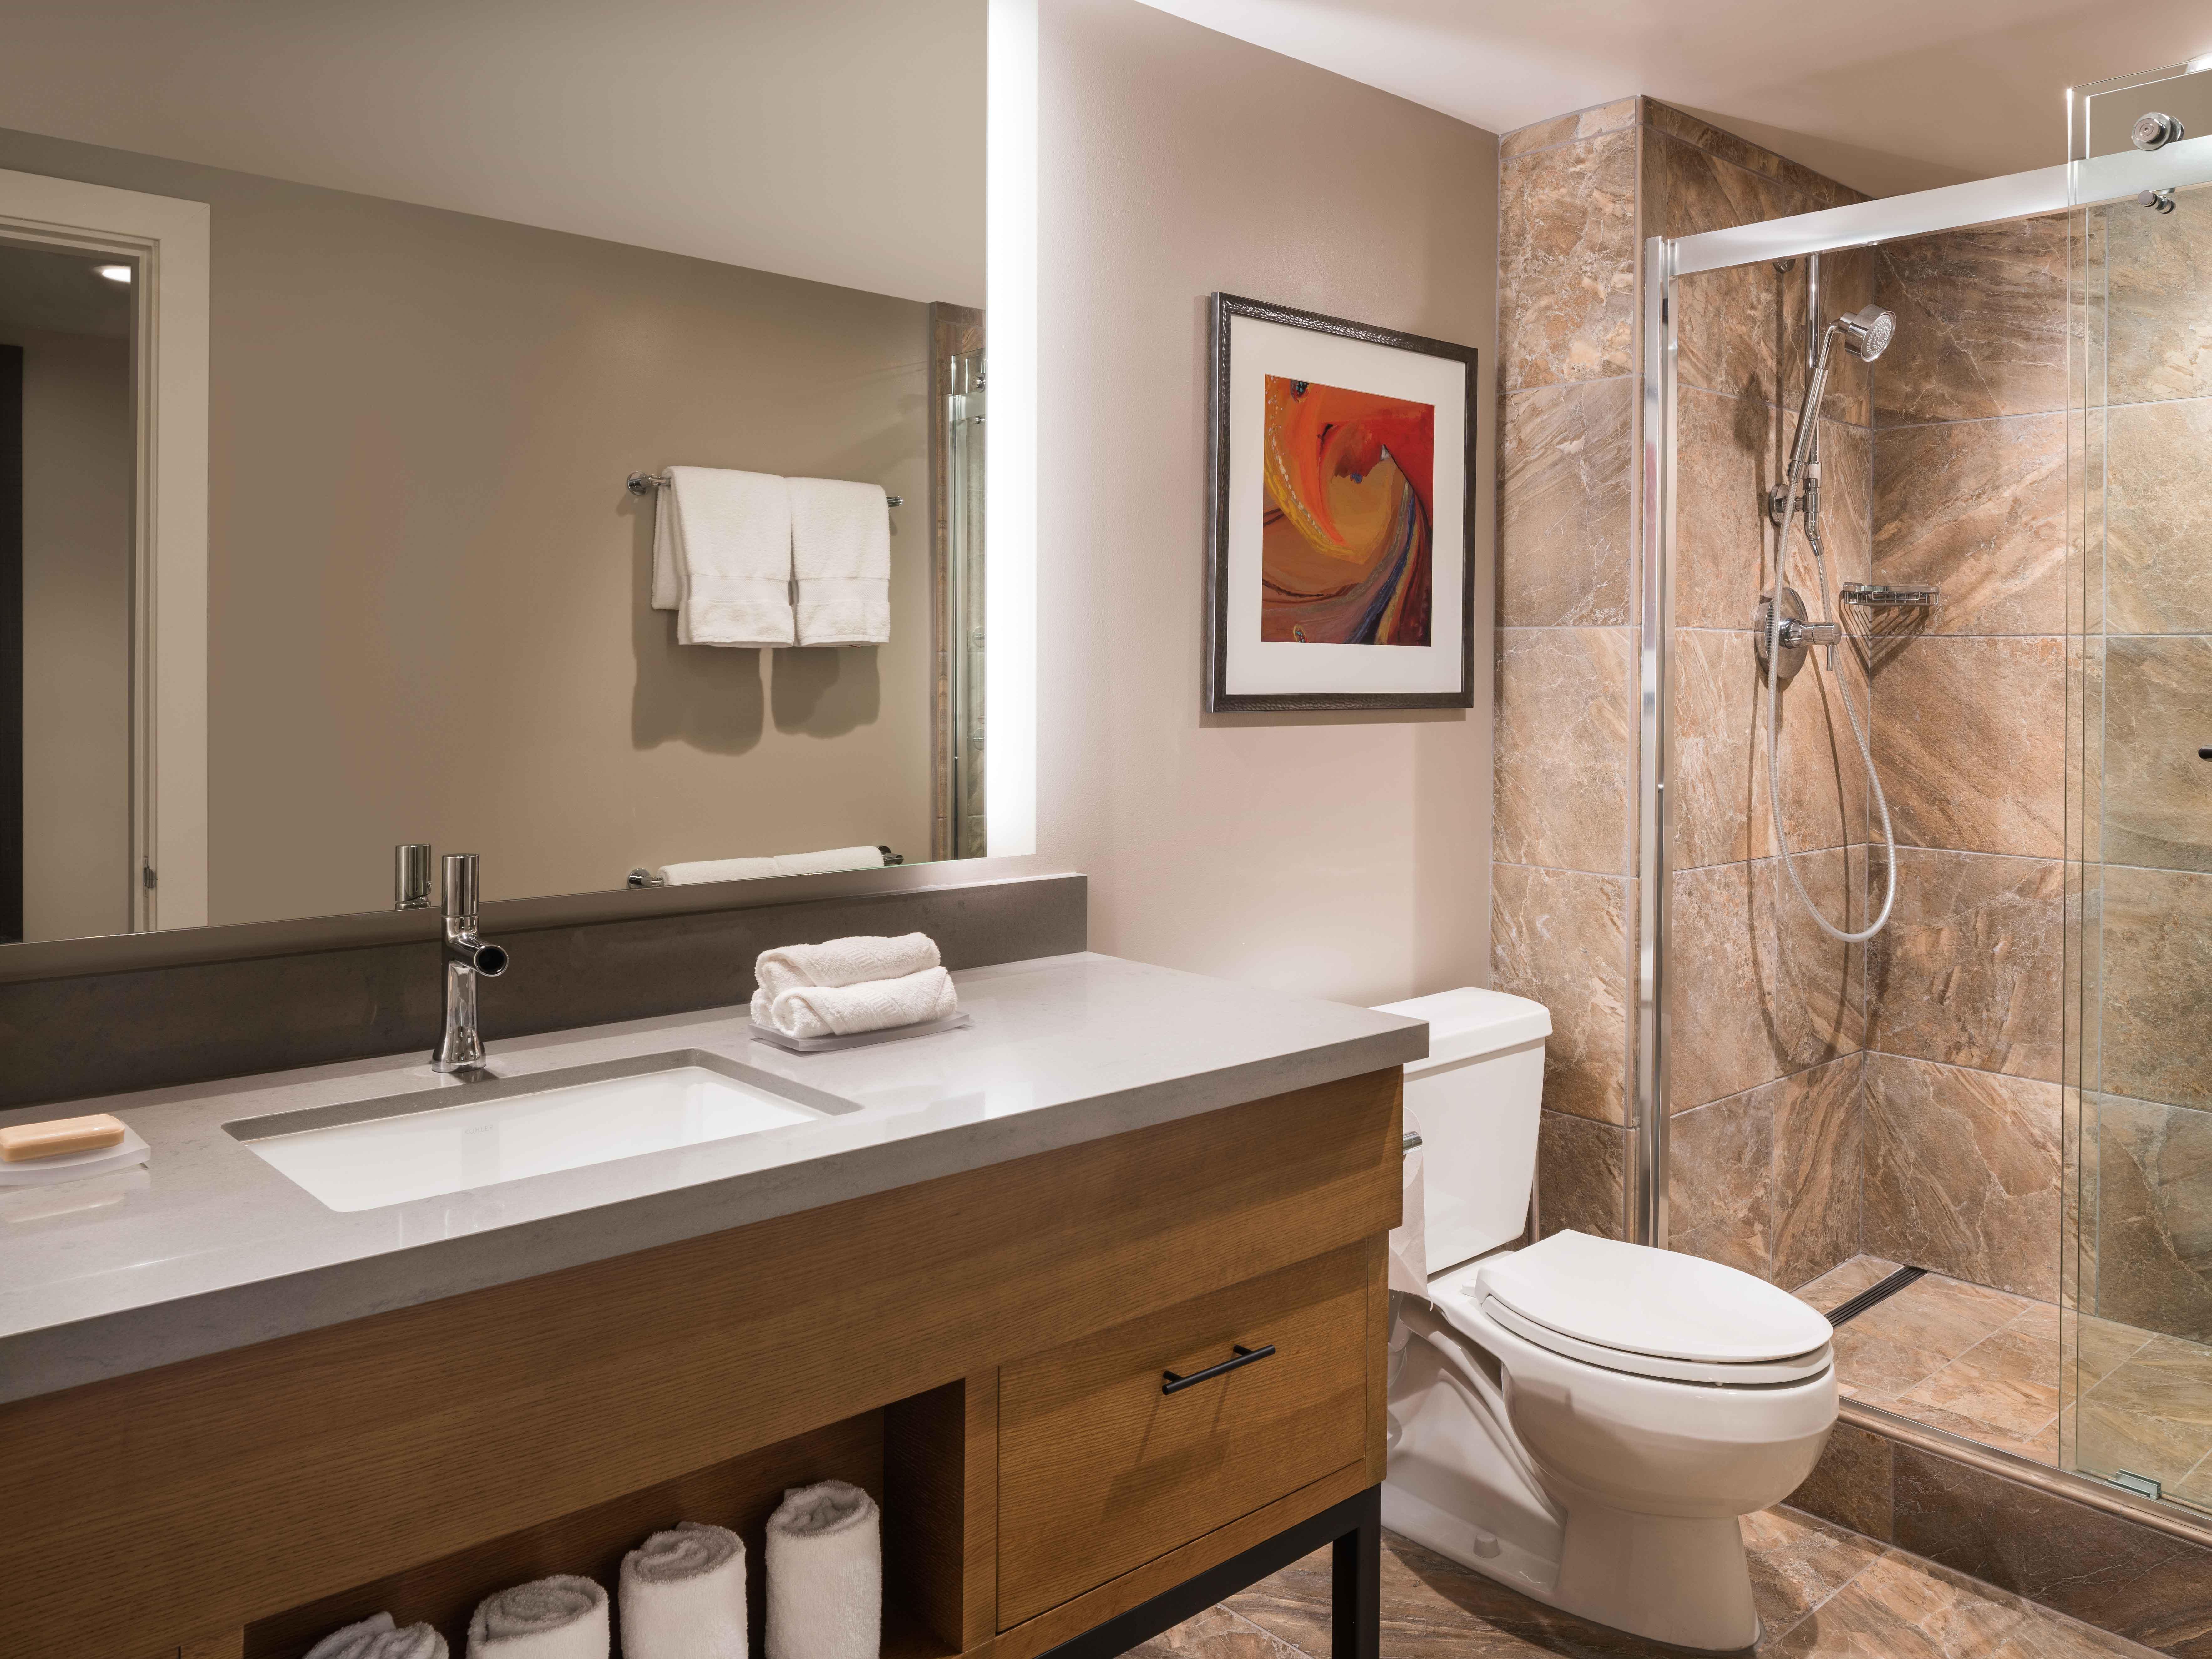 Marriott's Waikoloa Ocean Club Master Bathroom. Marriott's Waikoloa Ocean Club is located in Waikoloa Beach, Big Island, Hawai'i United States.